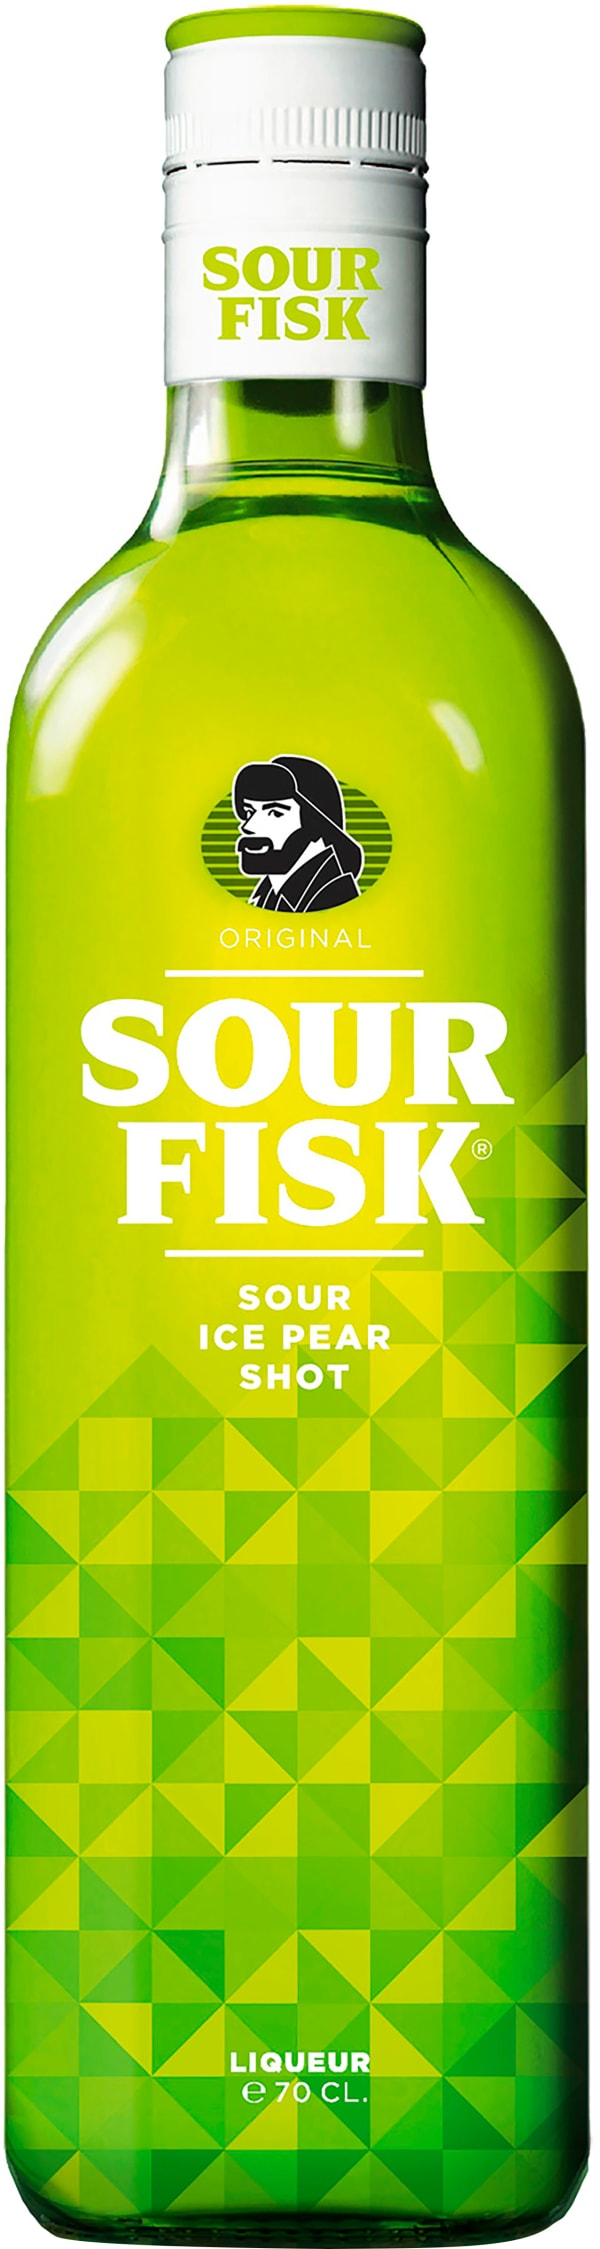 Sour Fisk Sour Ice Pear